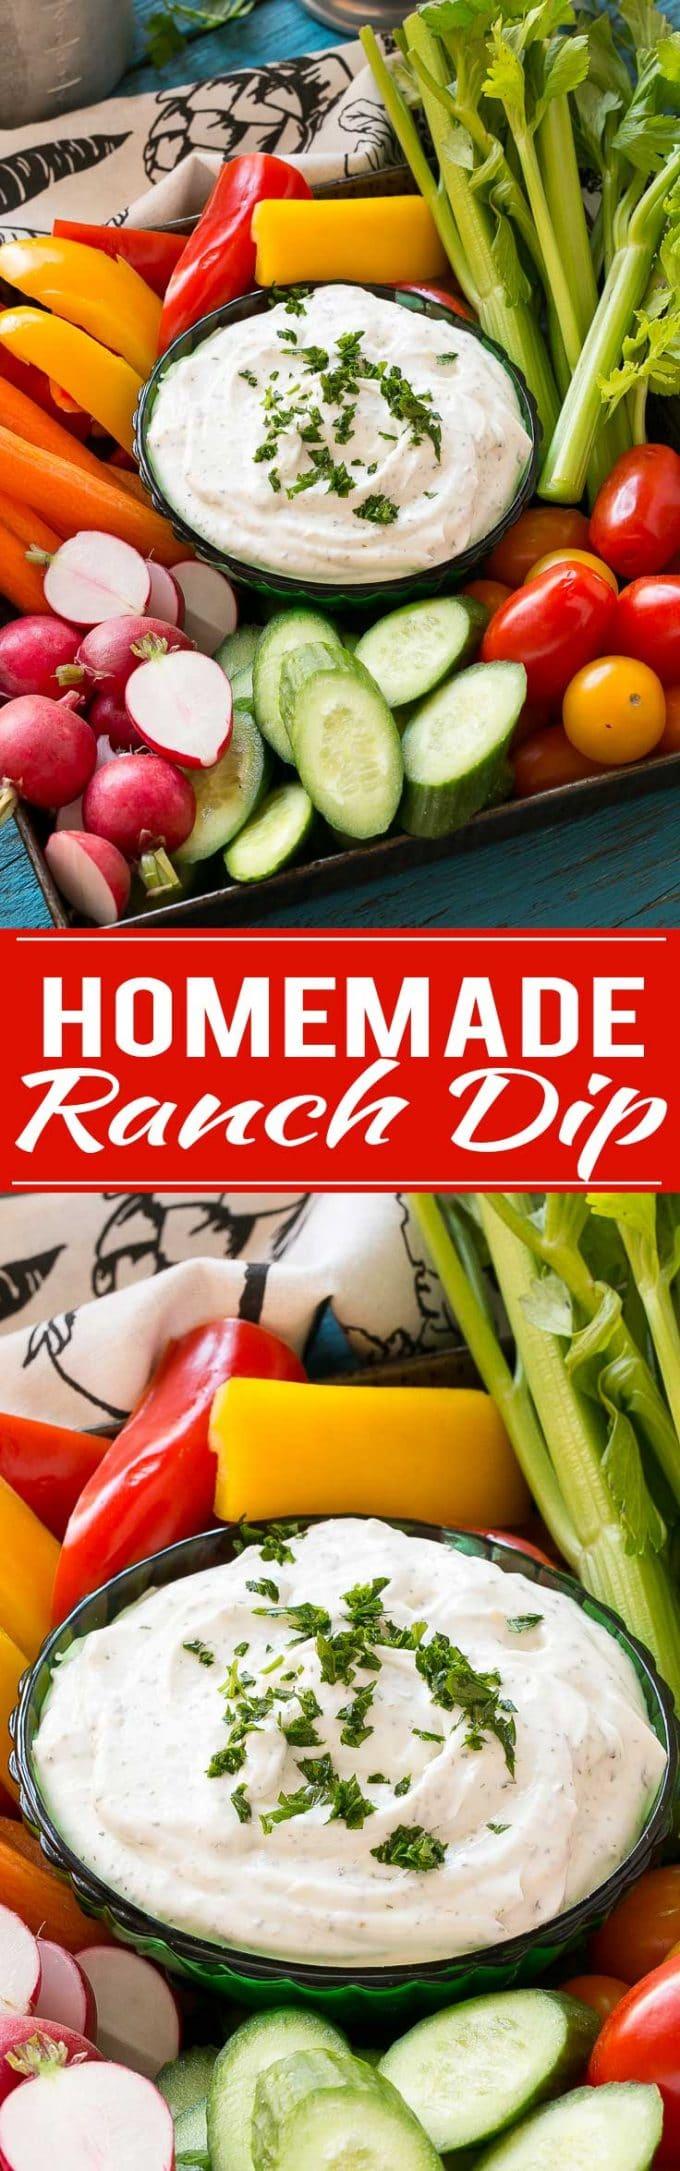 Homemade Ranch Dip Recipe | Homemade Ranch Powder | Homemade Ranch Dressing | Best Ranch Dip | Best Ranch Powder